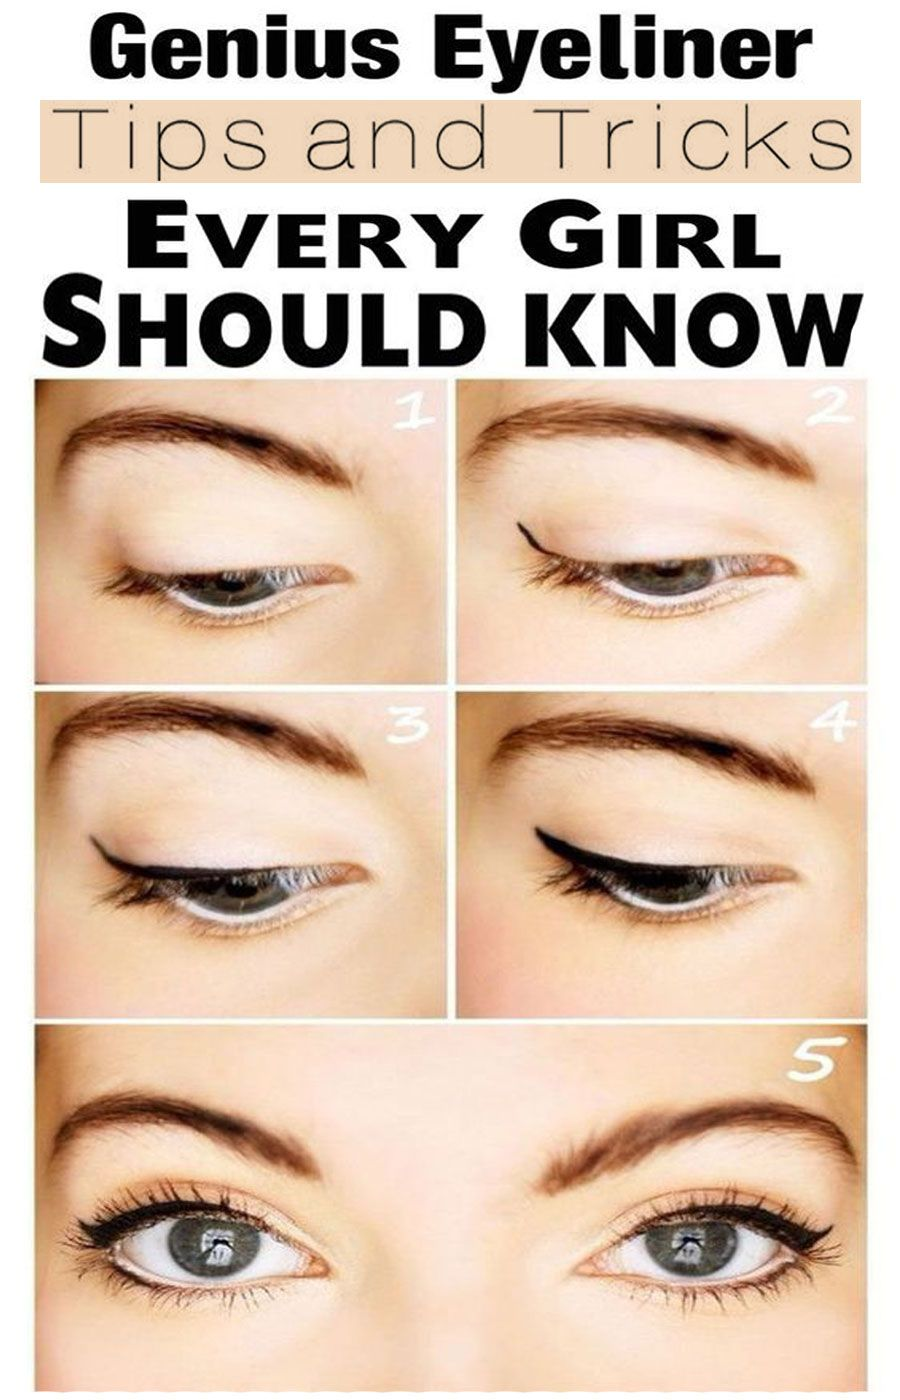 12 Genius Eyeliner tricks  Eyeliner for beginners, Eye liner